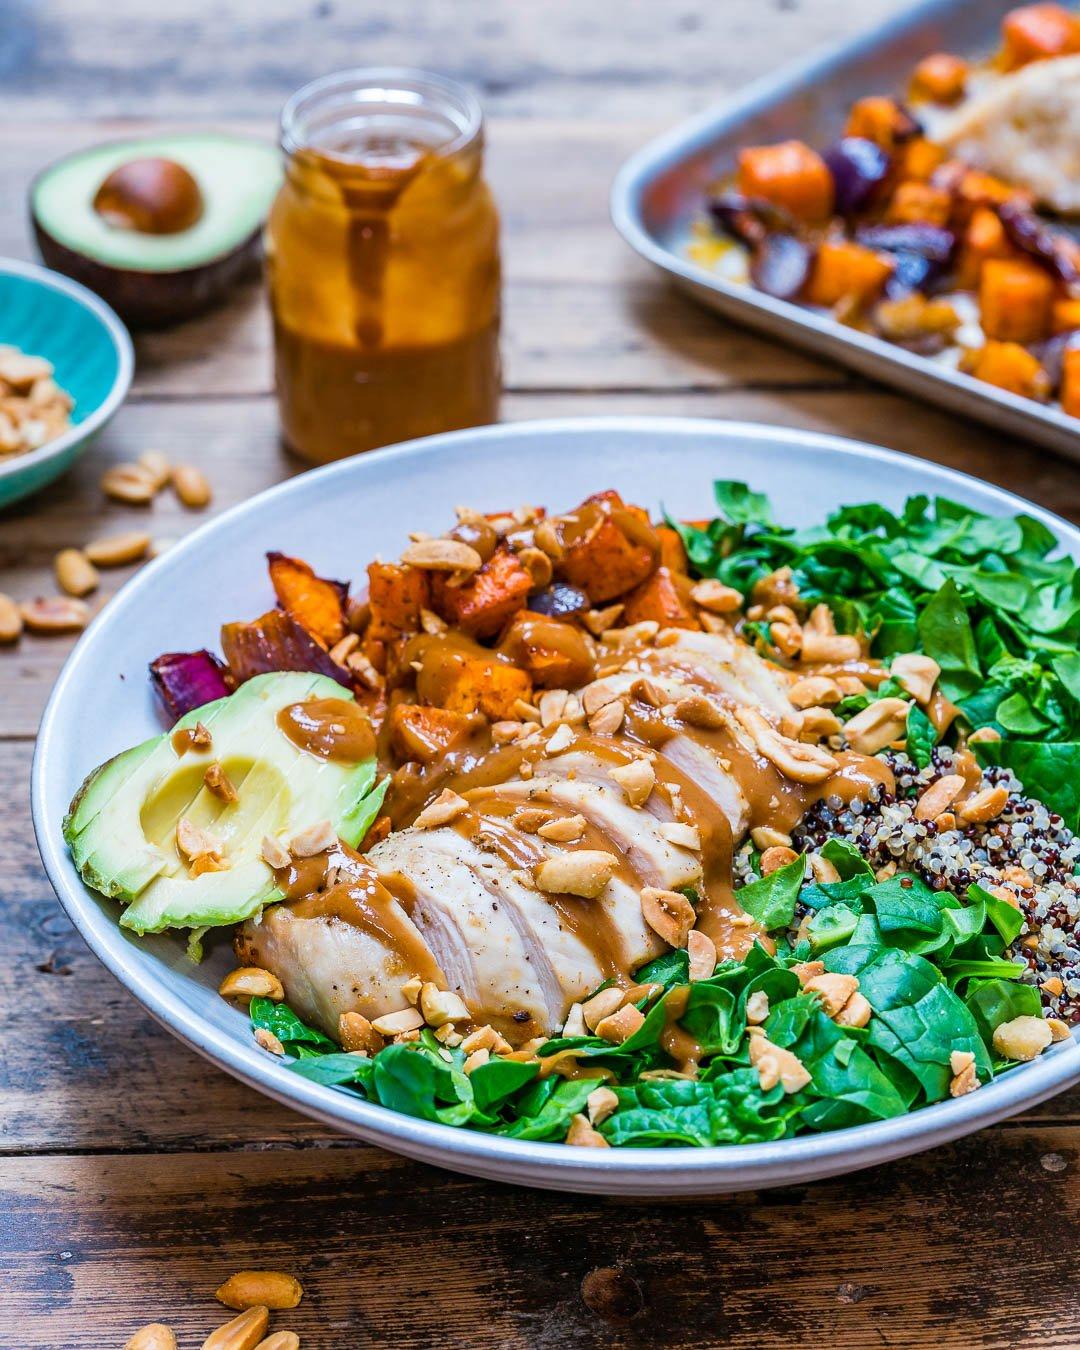 Salata De Pui Cu Legume La Cuptor si Quinoa - Reteta Video 4